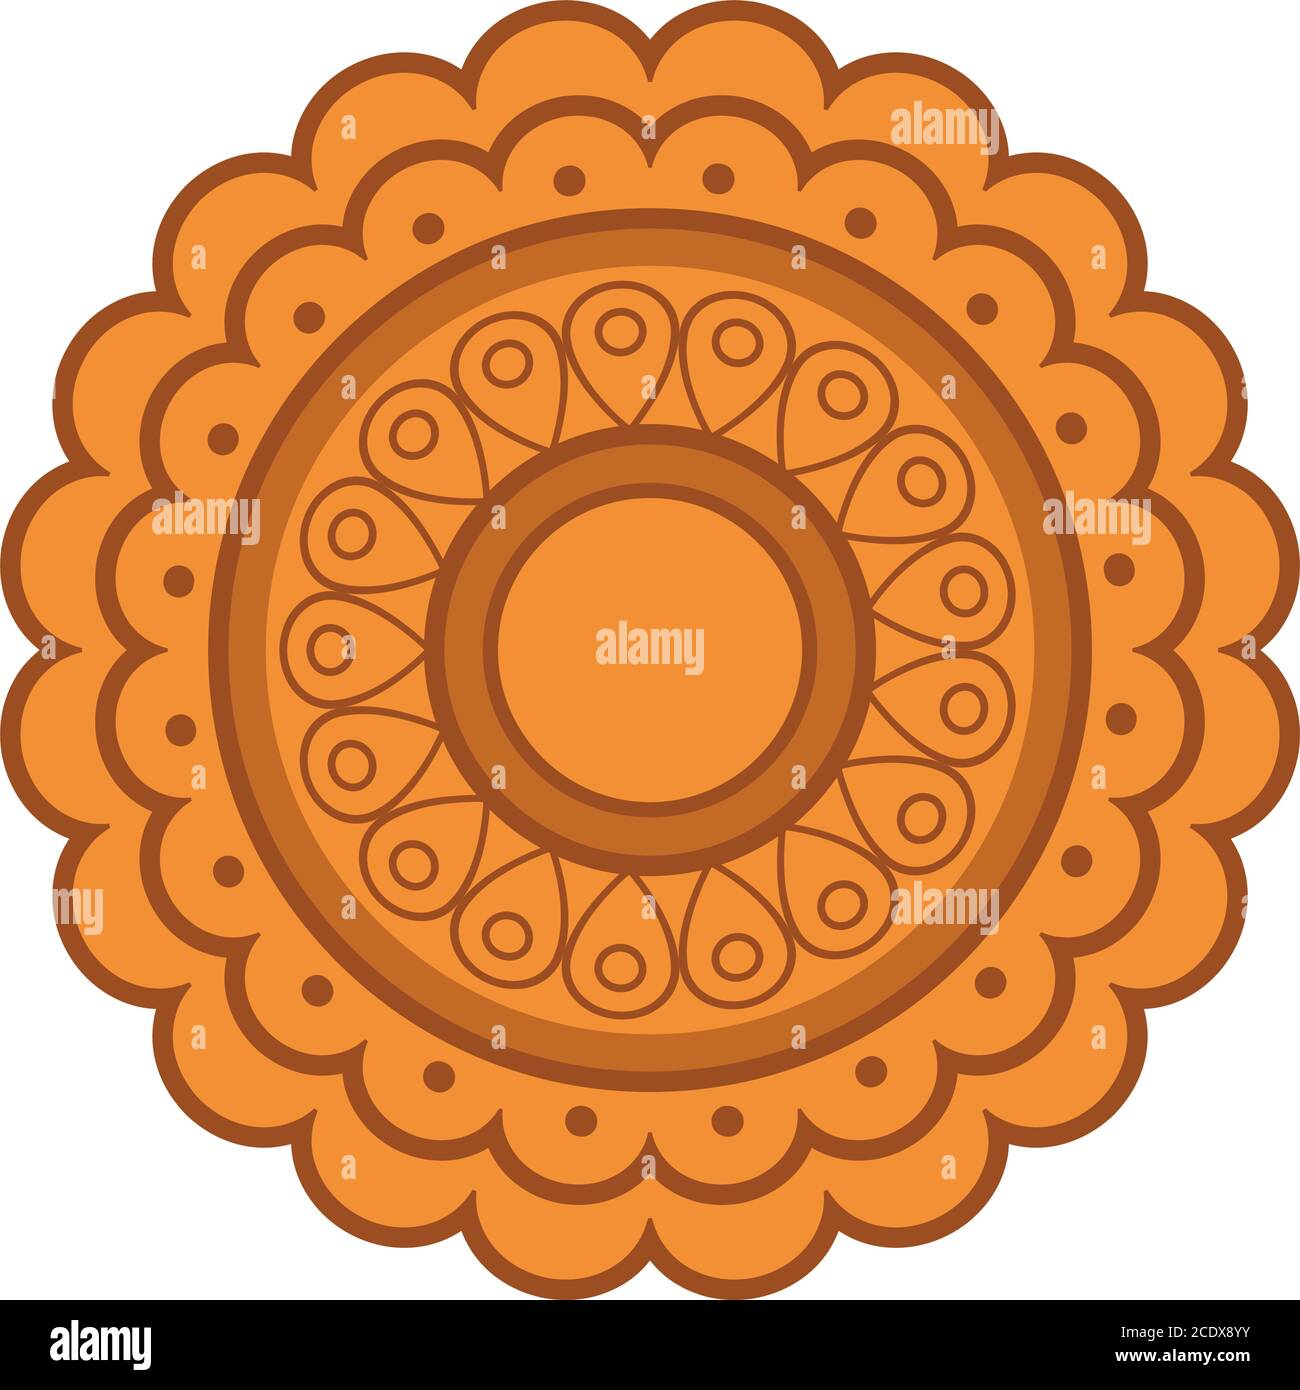 mooncake design, Happy mid autumn harvest festival oriental chinese and celebration theme Vector illustration Stock Vector